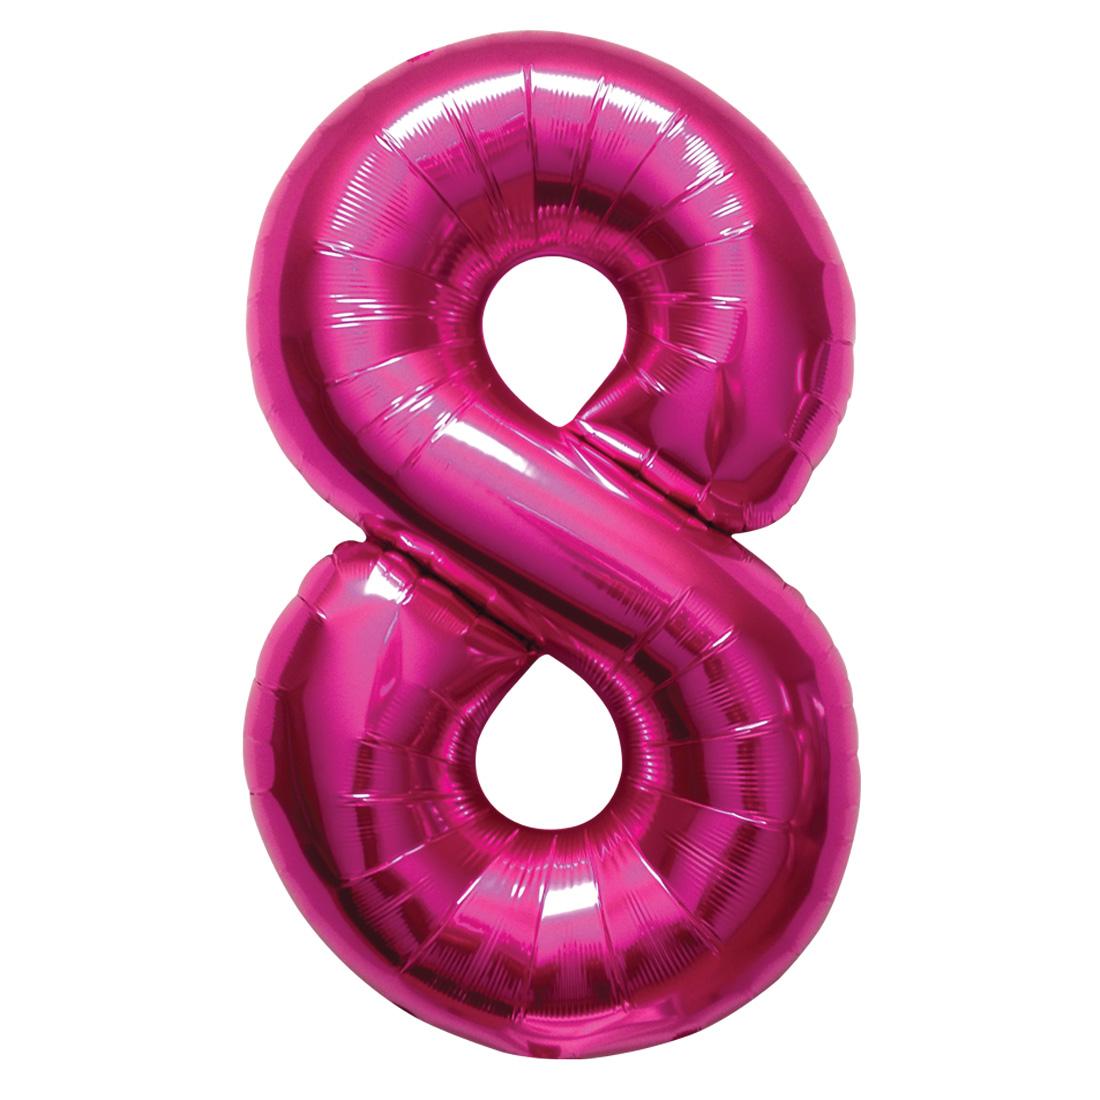 "Northstar Number 8 Eight Shape Solid Jumbo Helium 34"" Foil Balloon, Magenta"